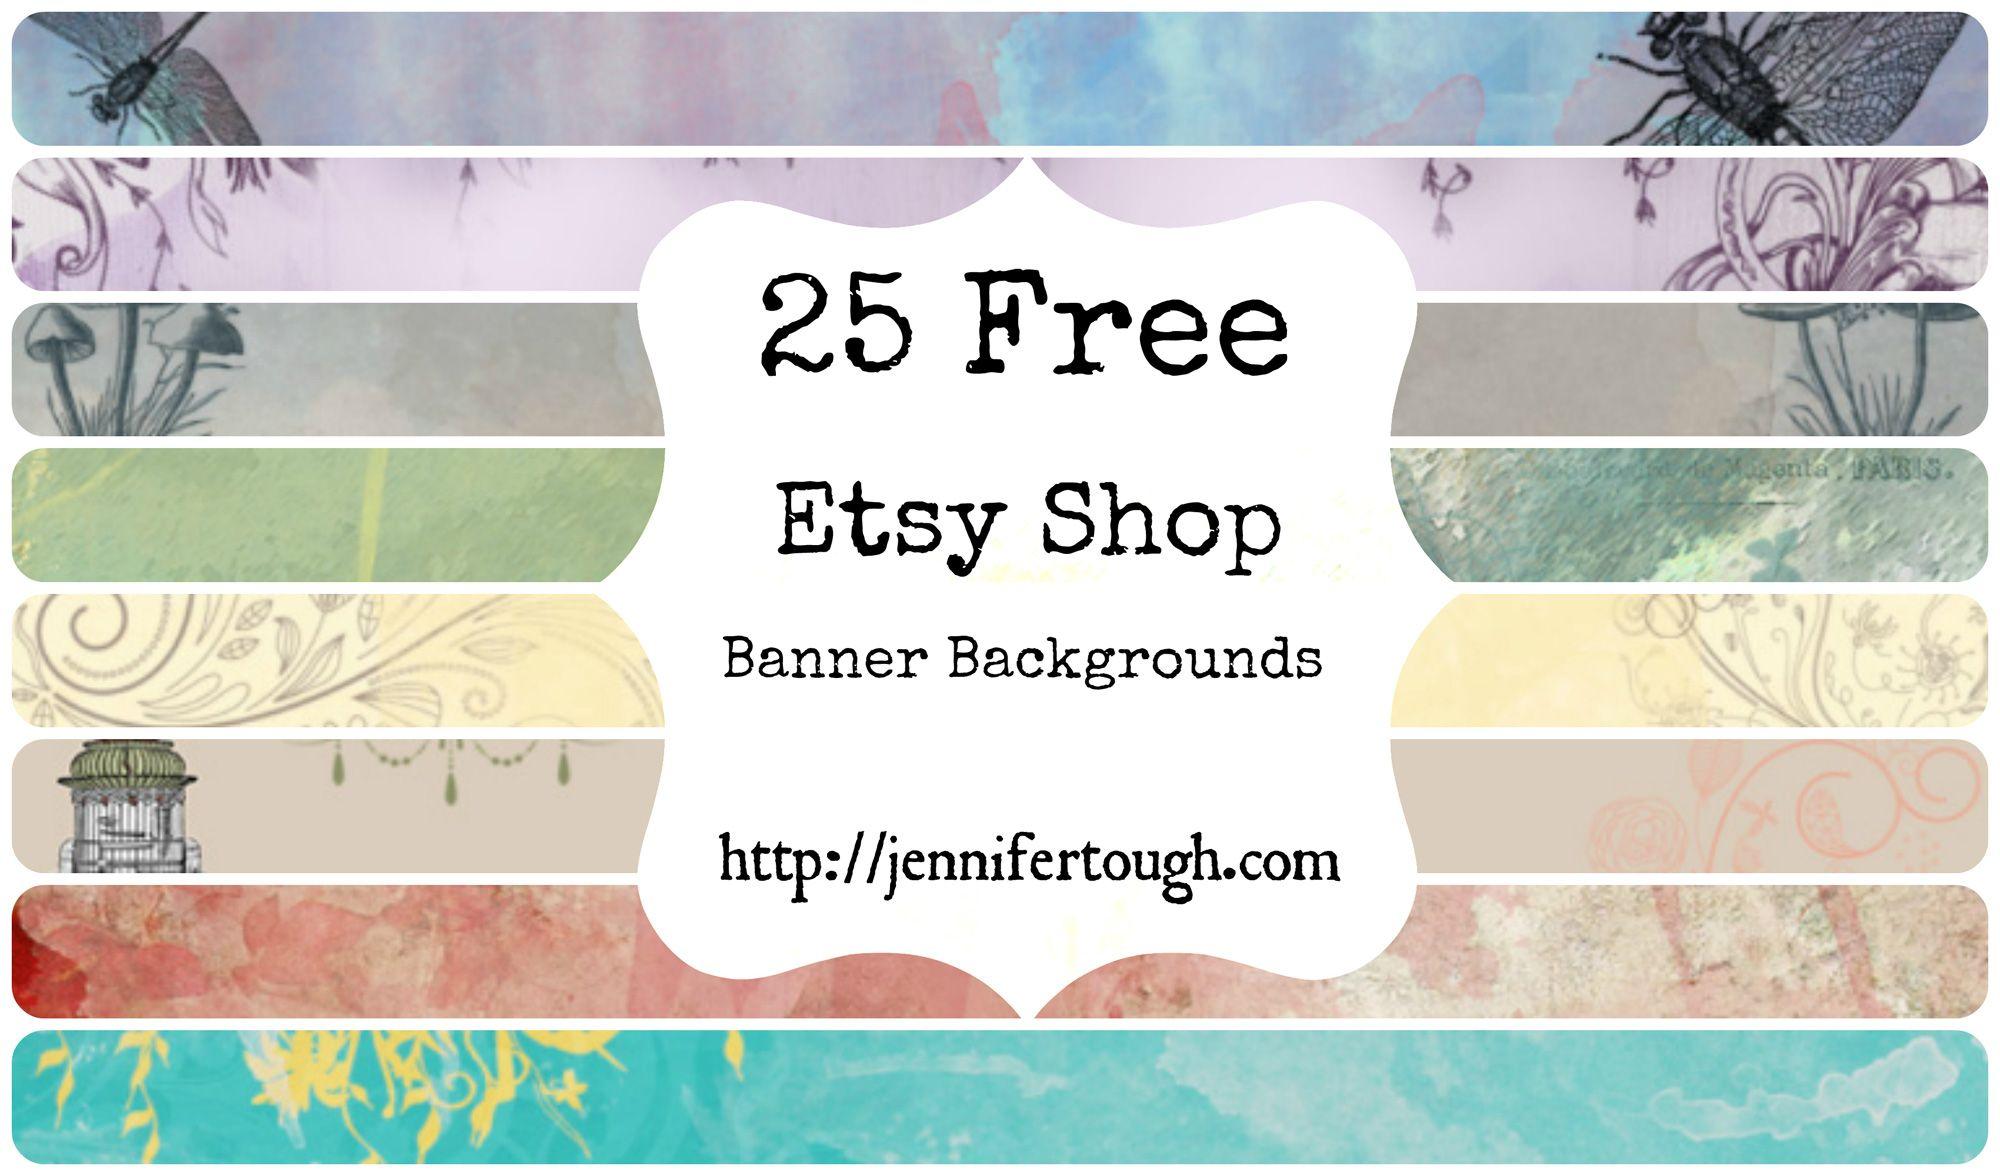 25 free etsy banner backgrounds diy crafts pinterest banners etsy and free. Black Bedroom Furniture Sets. Home Design Ideas